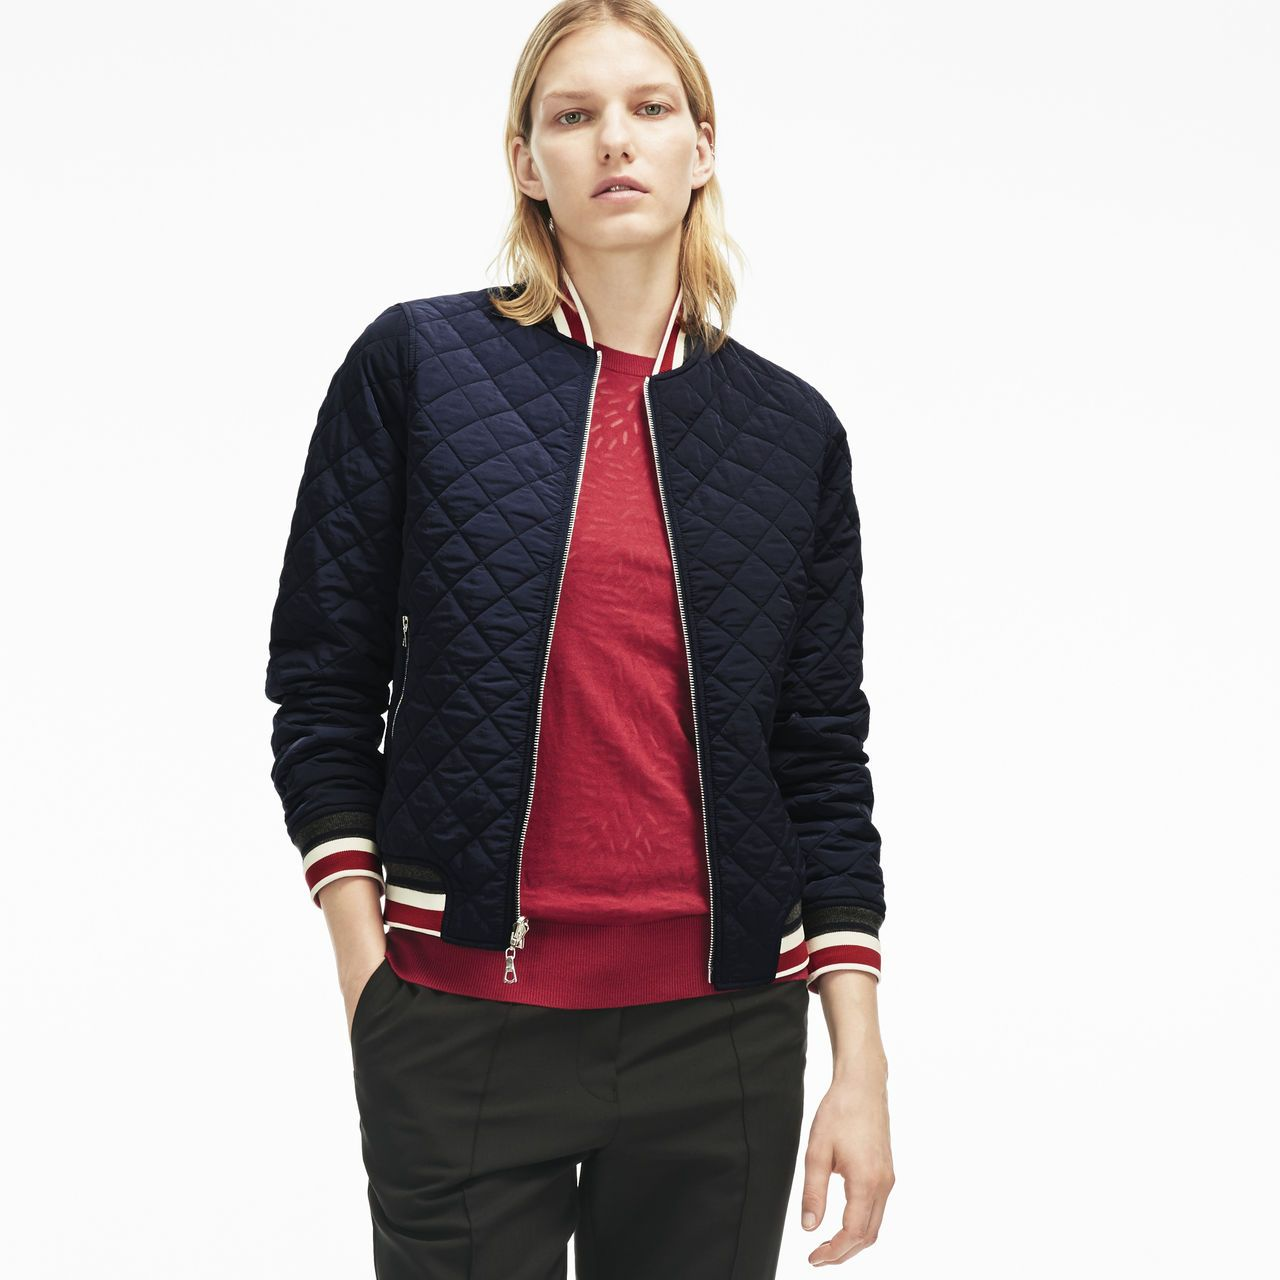 Women S Reversible Quilted Taffeta Bomber Jacket Lacoste Bomber Jacket Lacoste Women Striped Jacket [ 1280 x 1280 Pixel ]